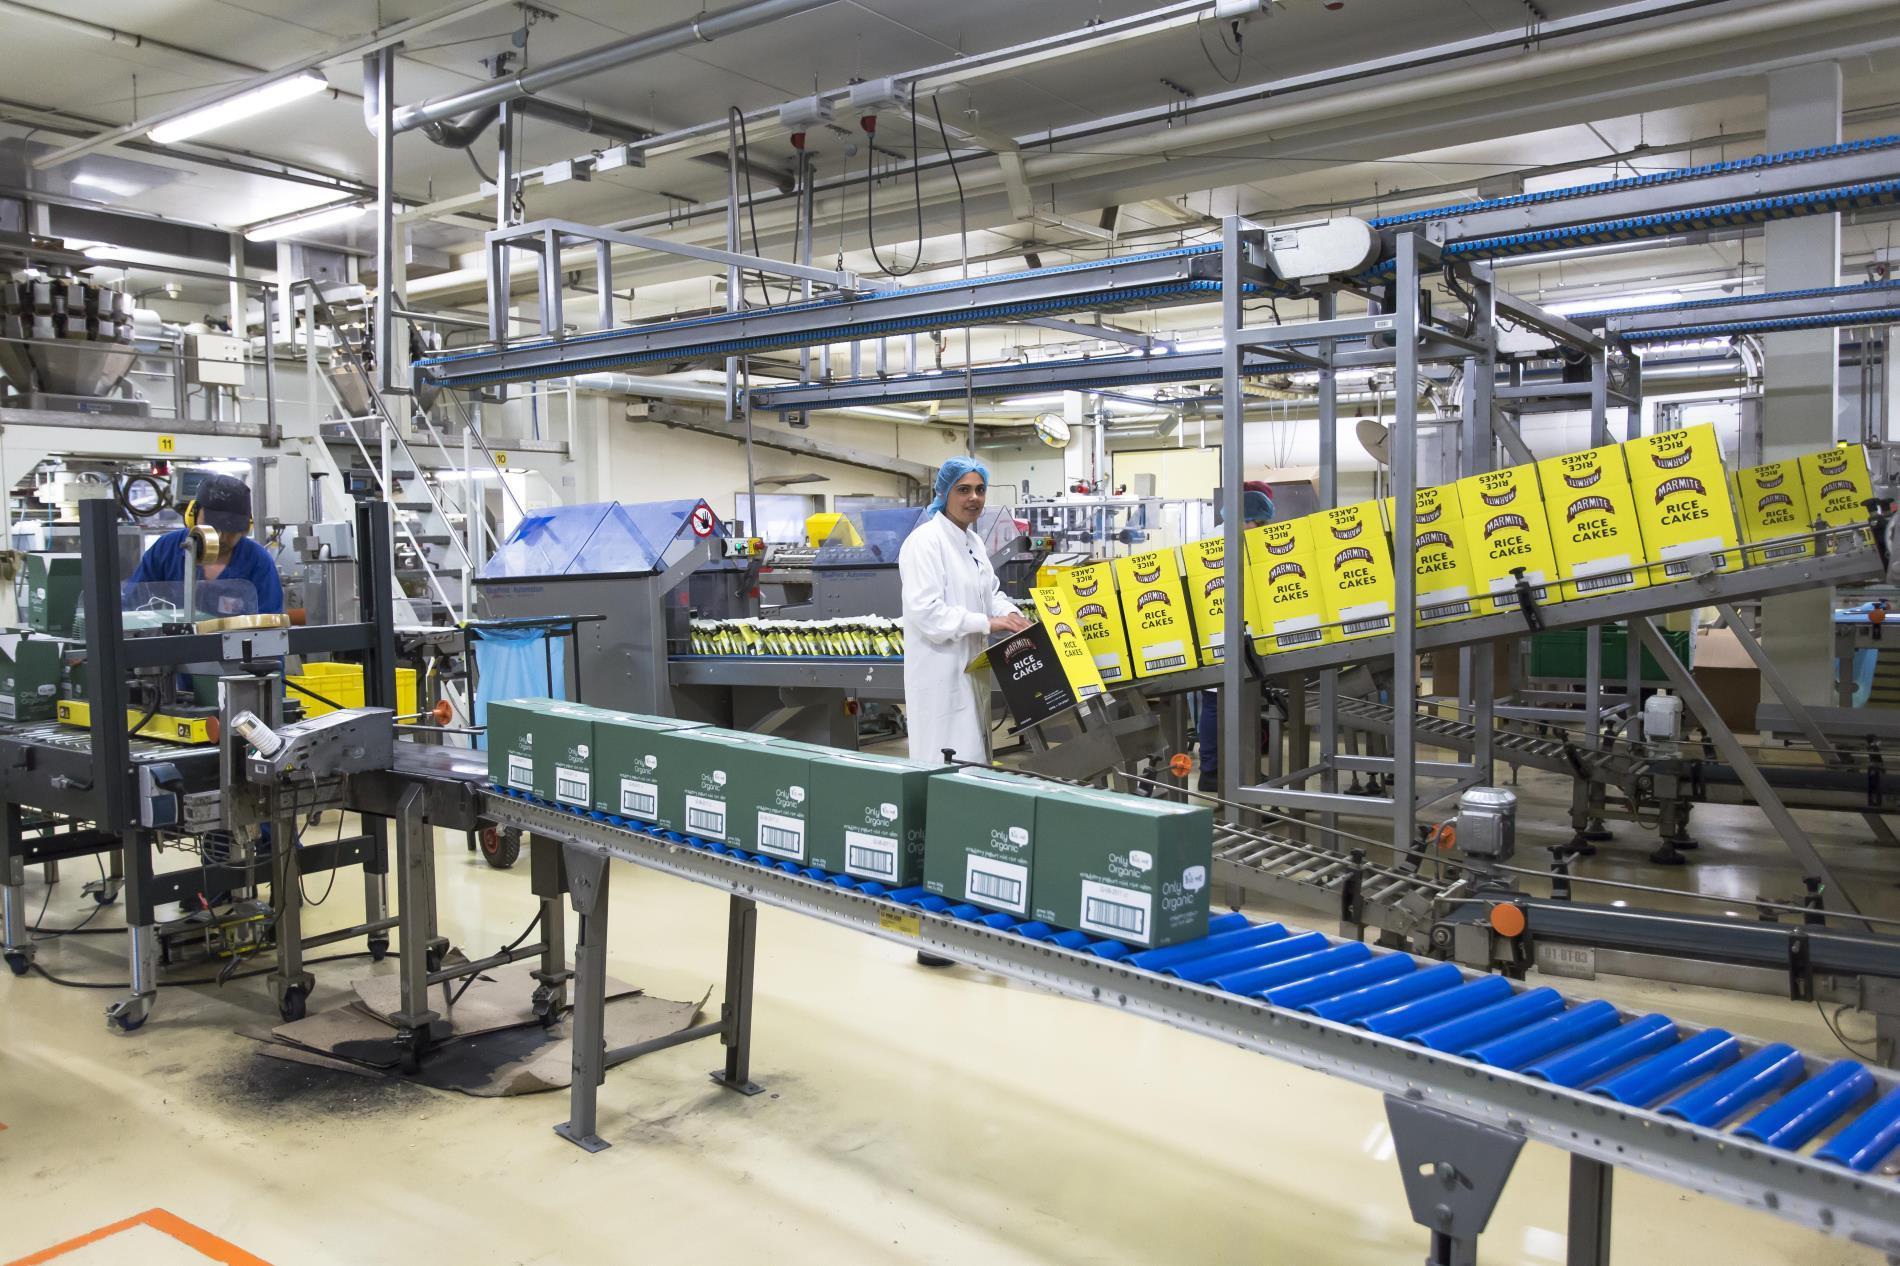 Aeres MBO Food voedingsmiddelentechnologie